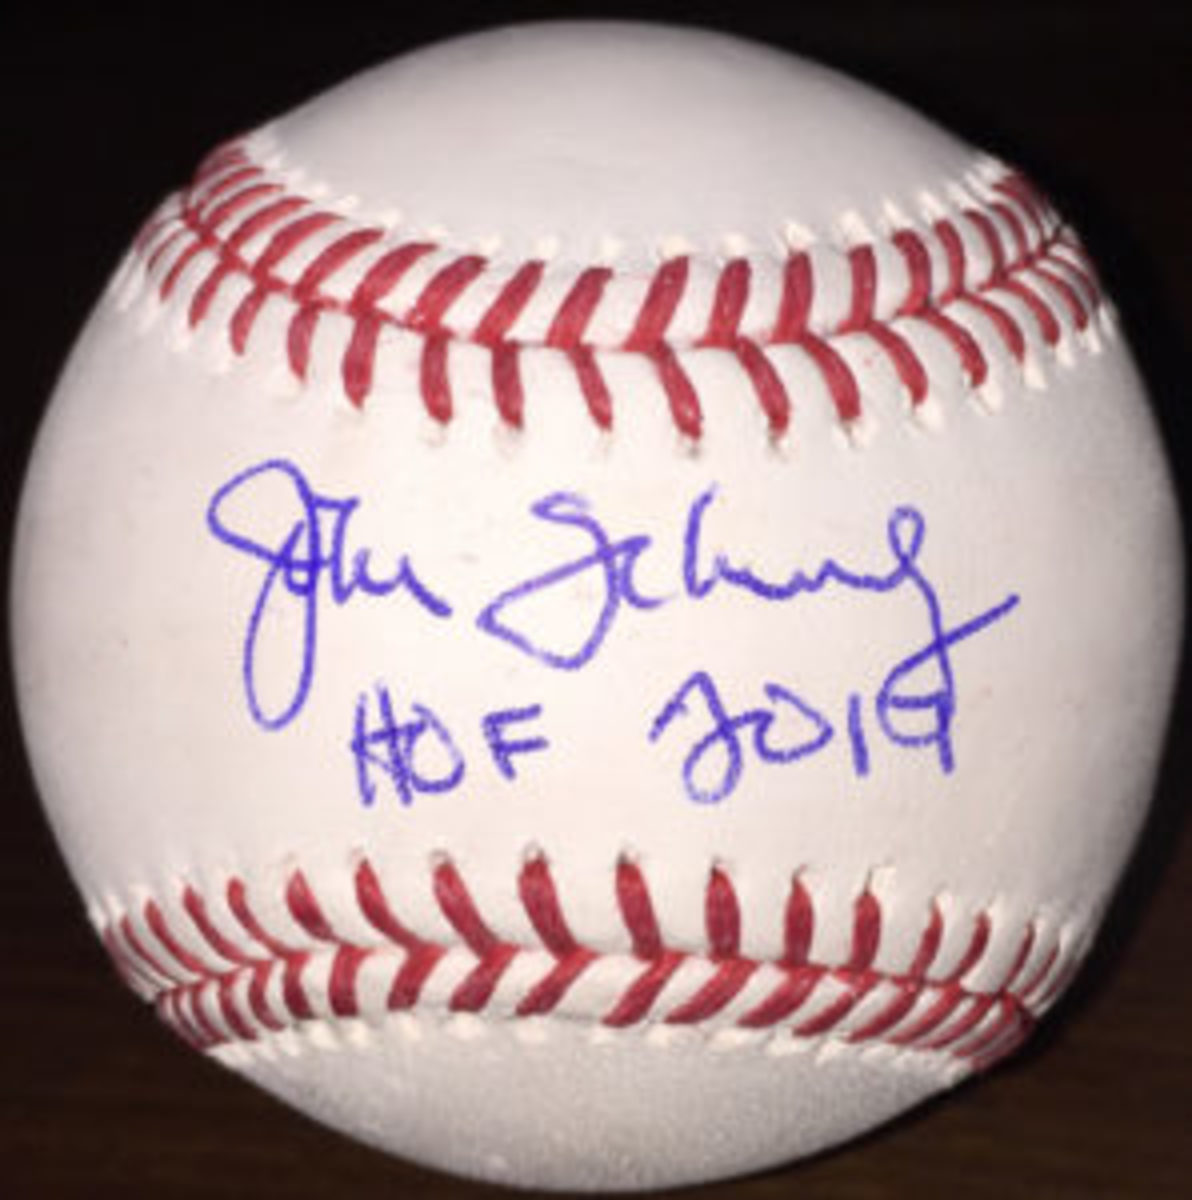 A baseball autographed by John Schuerholz.